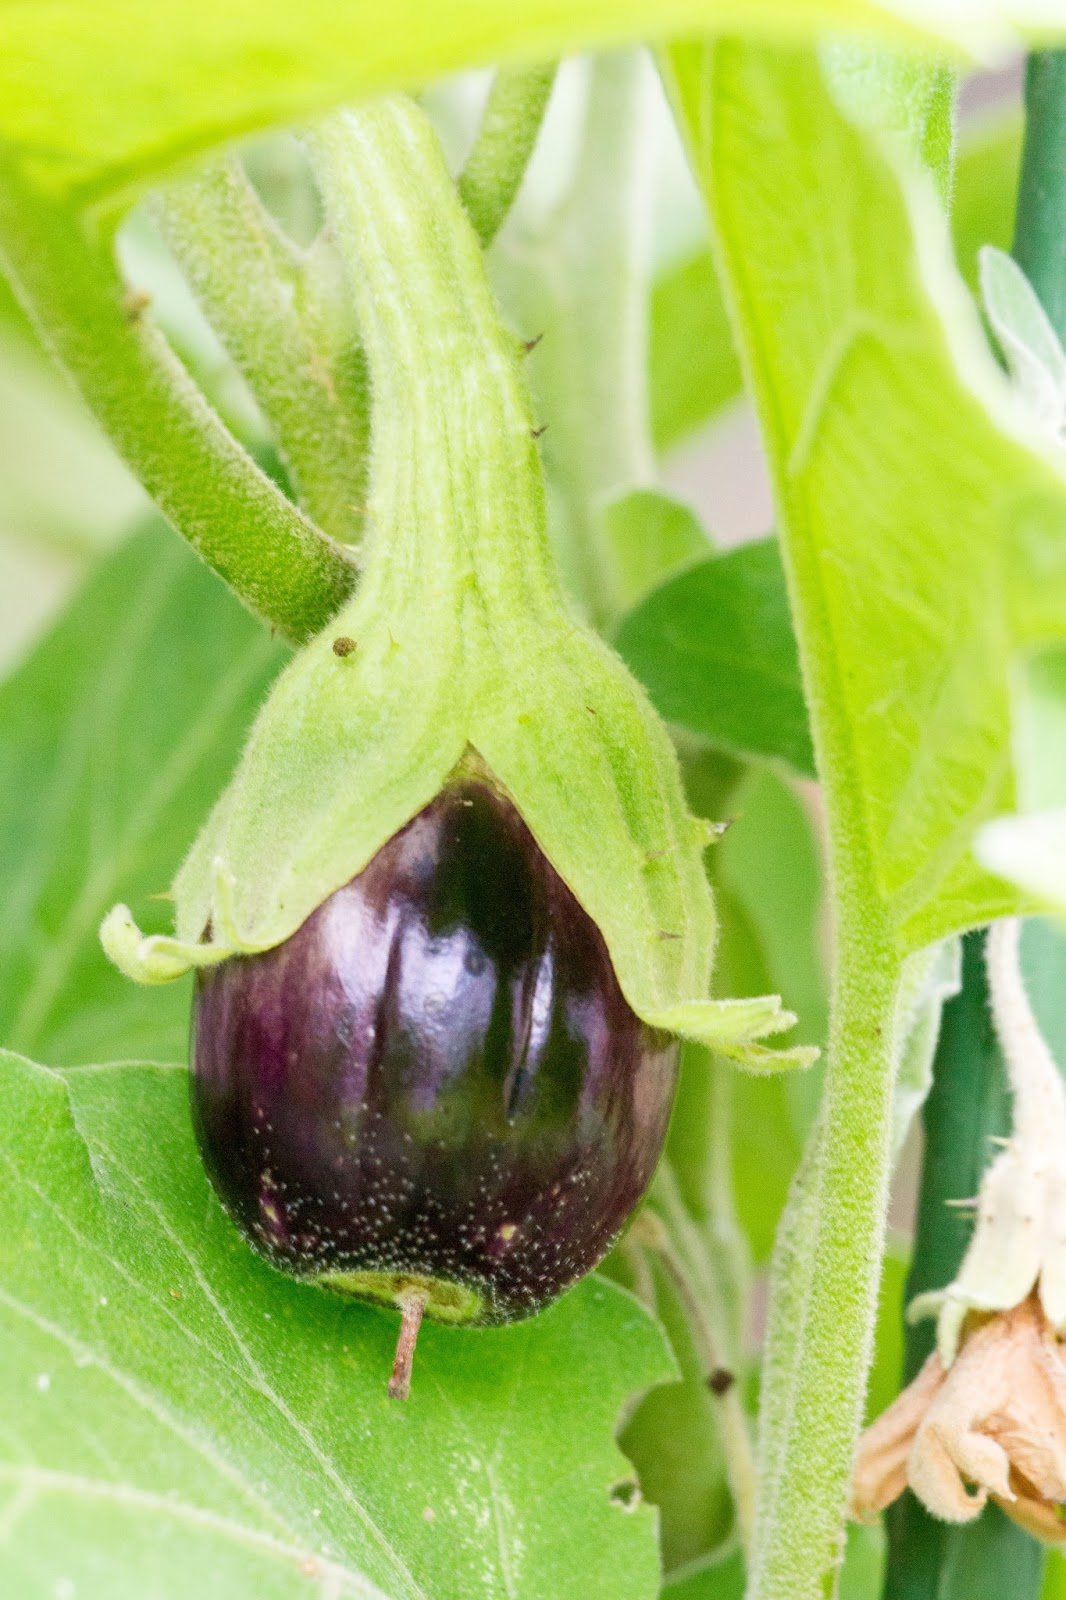 Eggplant on a plant